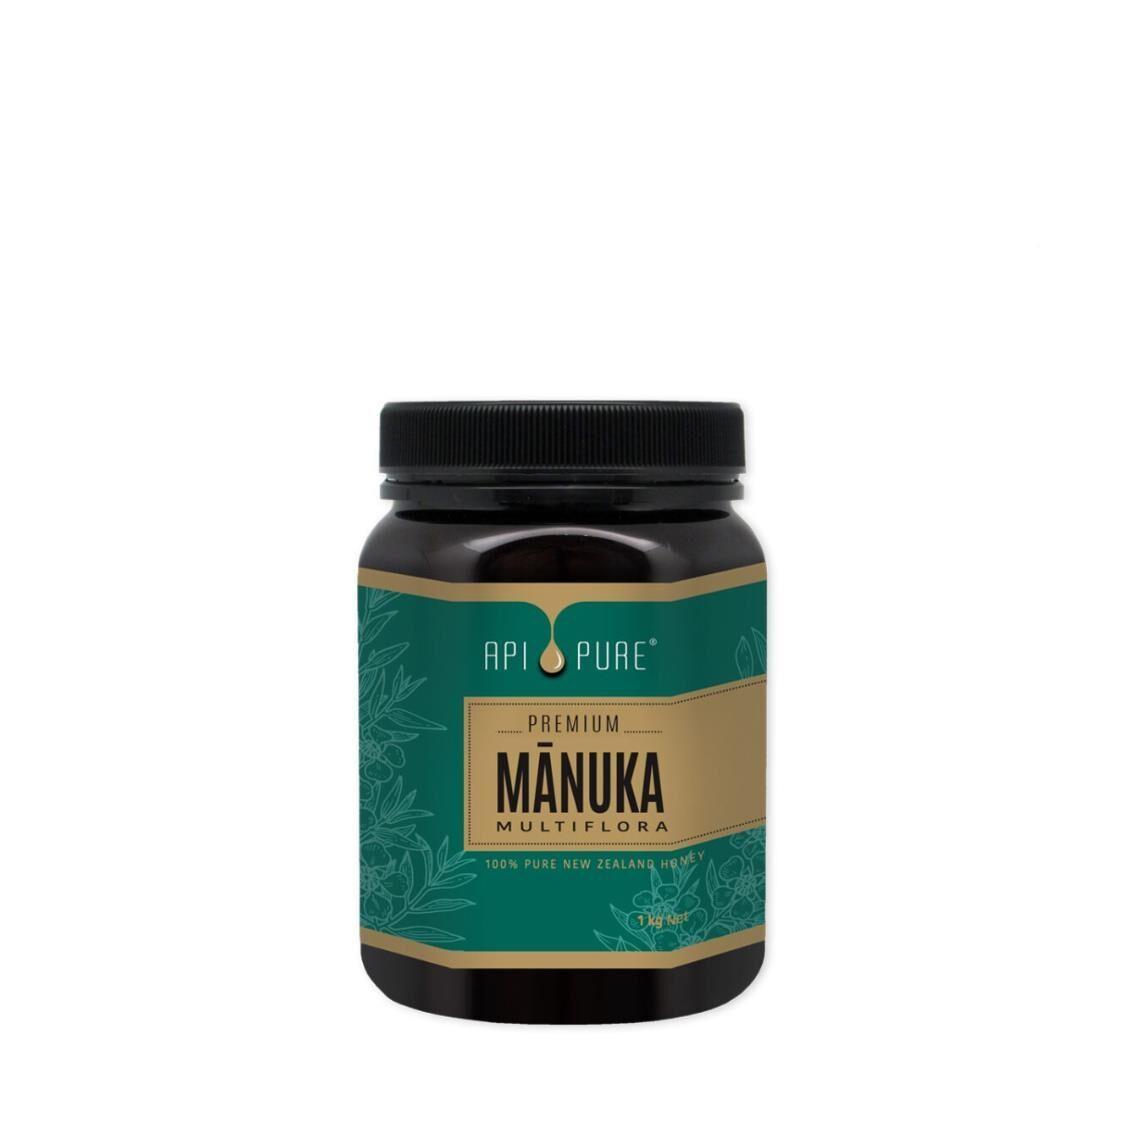 Apipure Premium Manuka 1kg